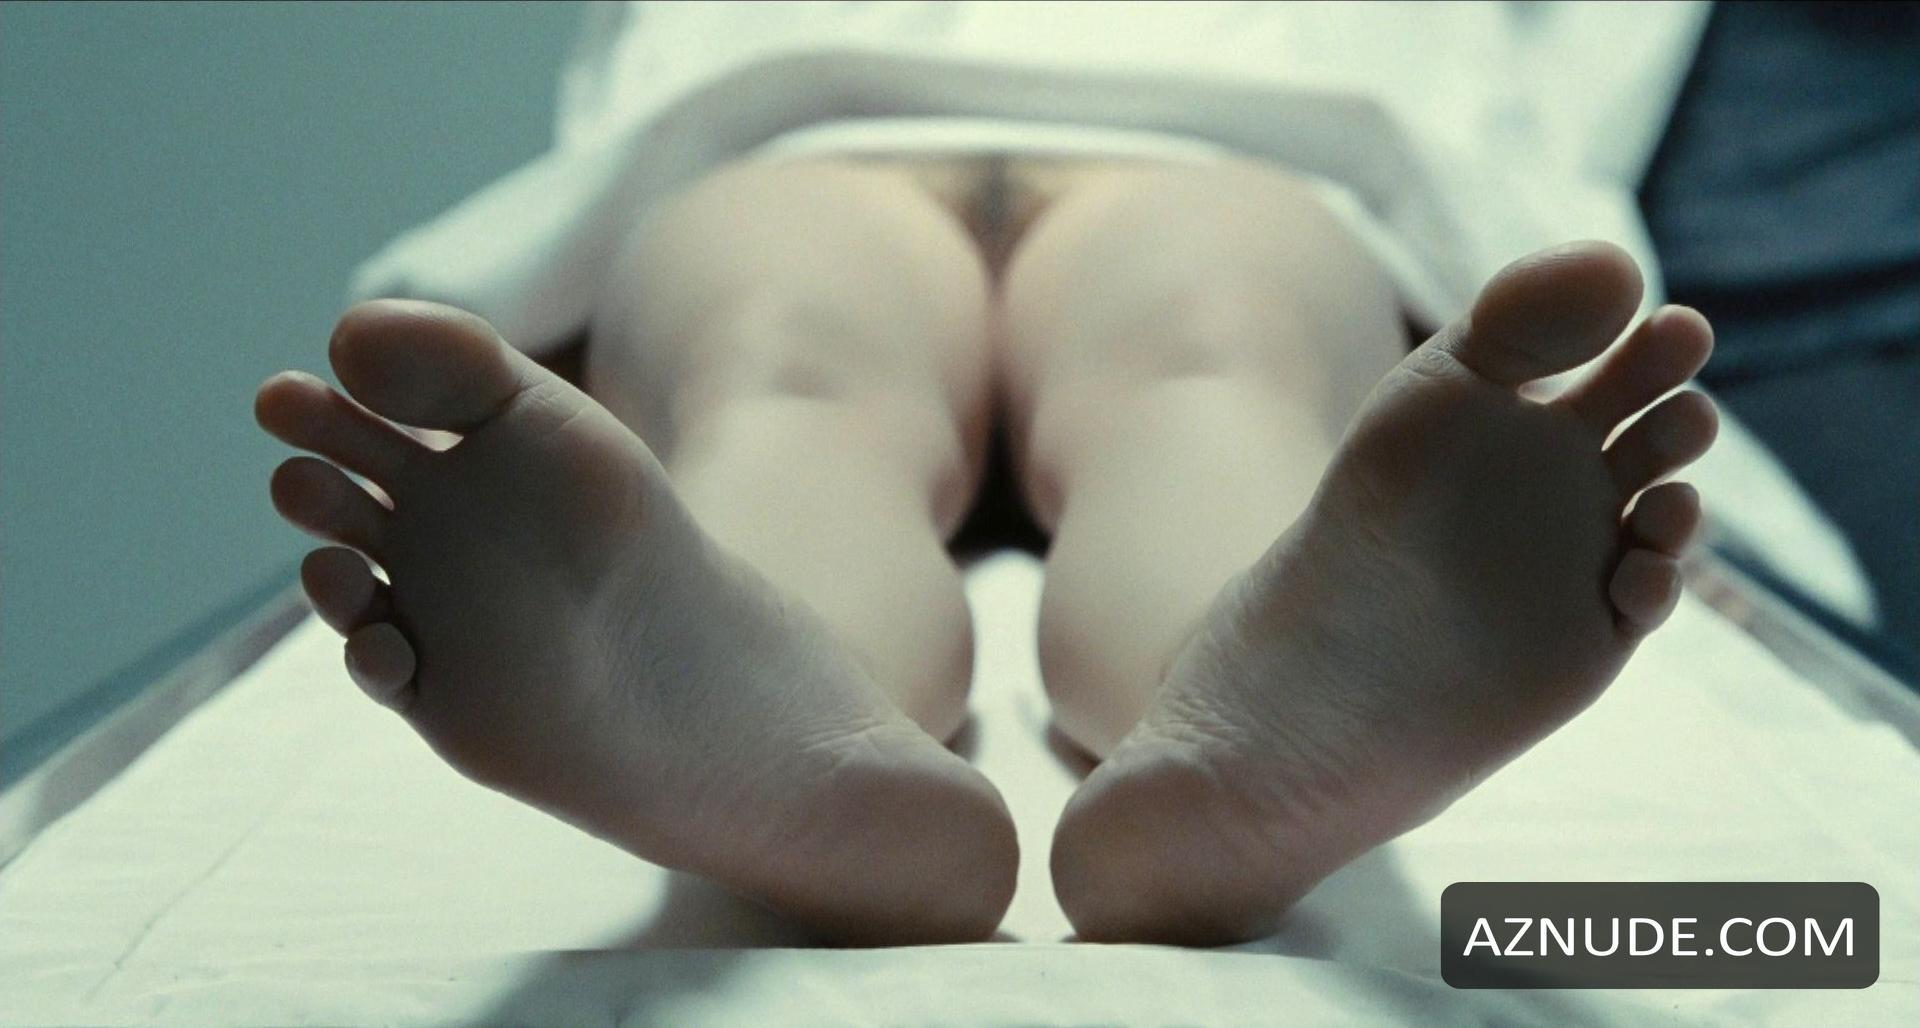 nude other people Sleeping with